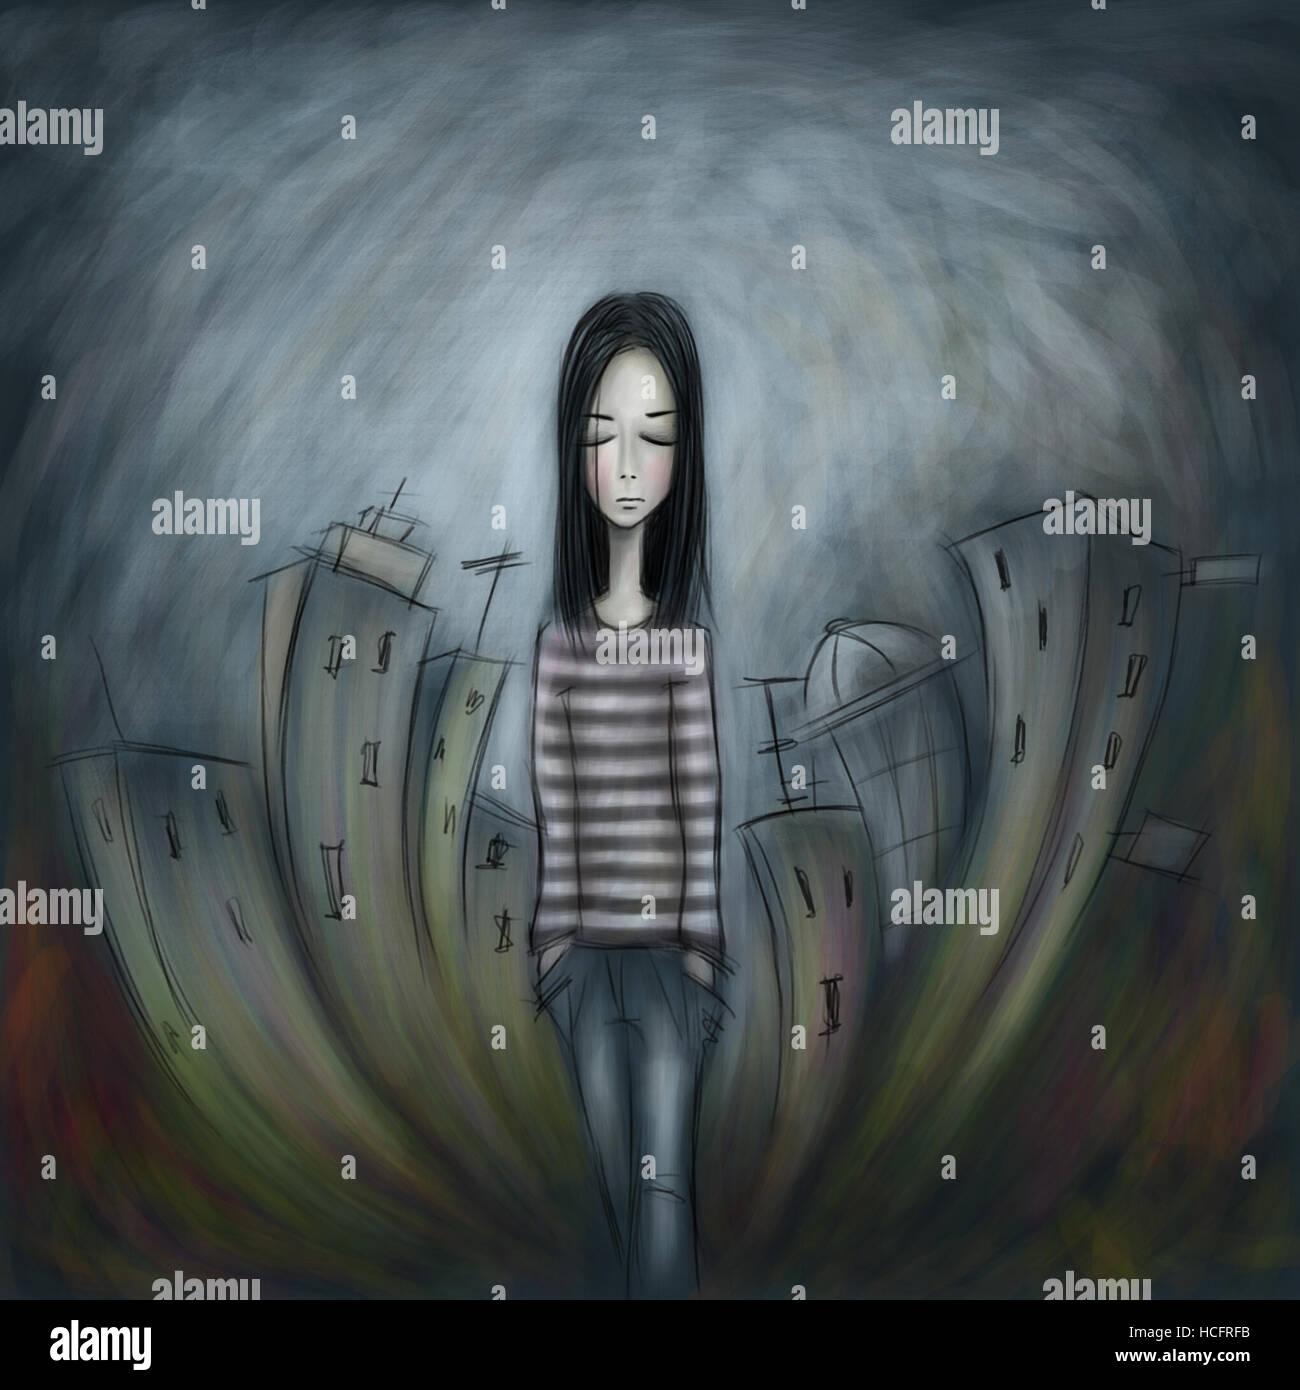 Foto di una ragazza solitaria a piedi lungo una strada di città Immagini Stock